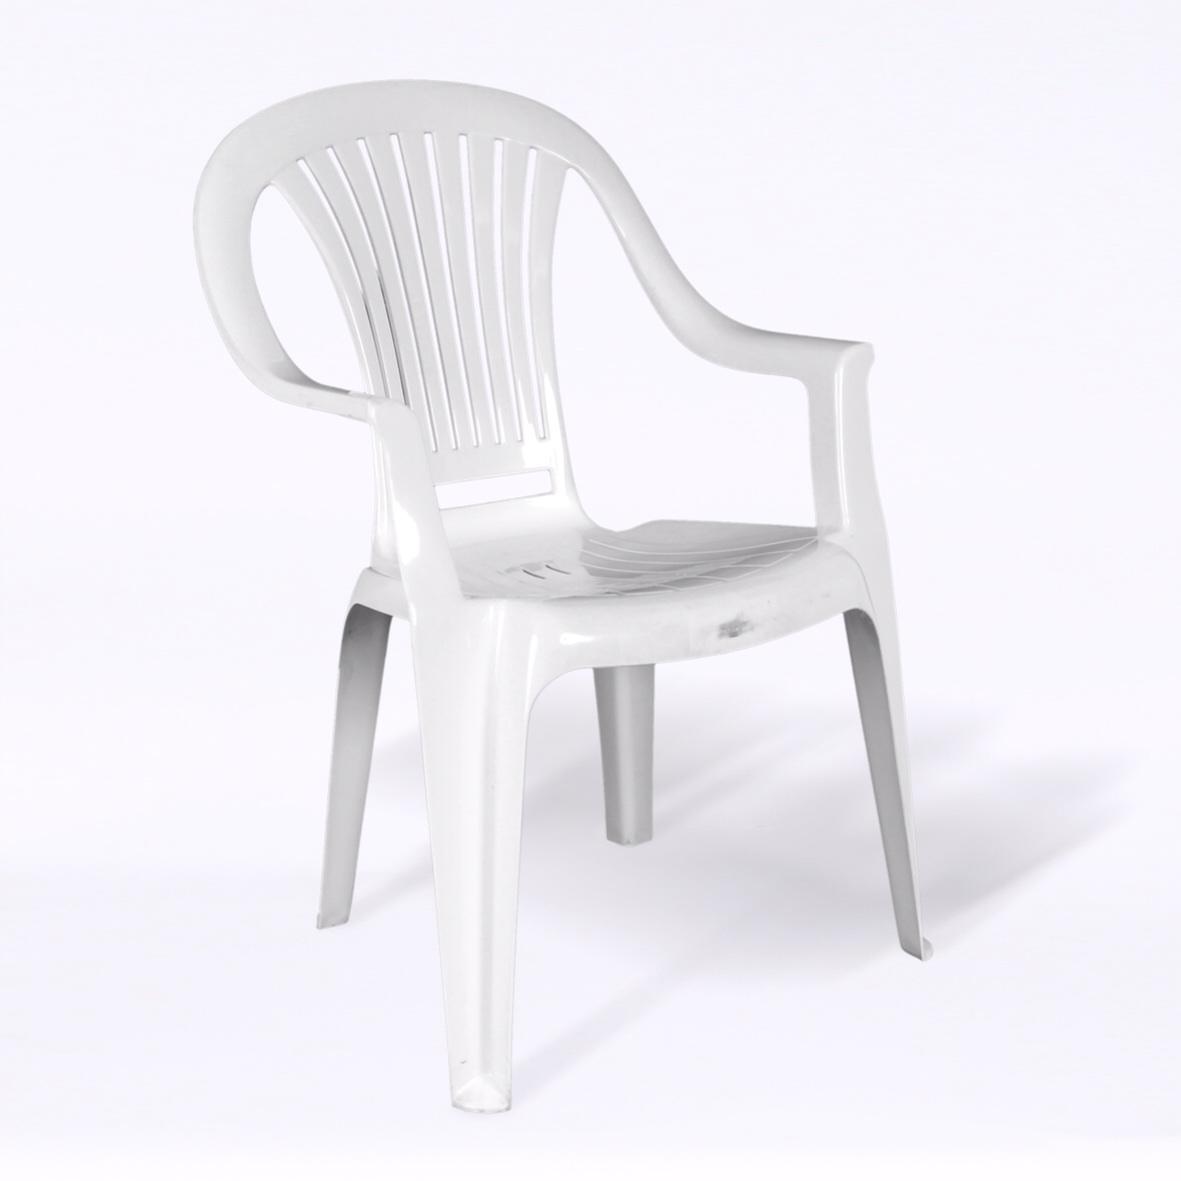 plastic garden chairs plastic garden chair QQOIOAD